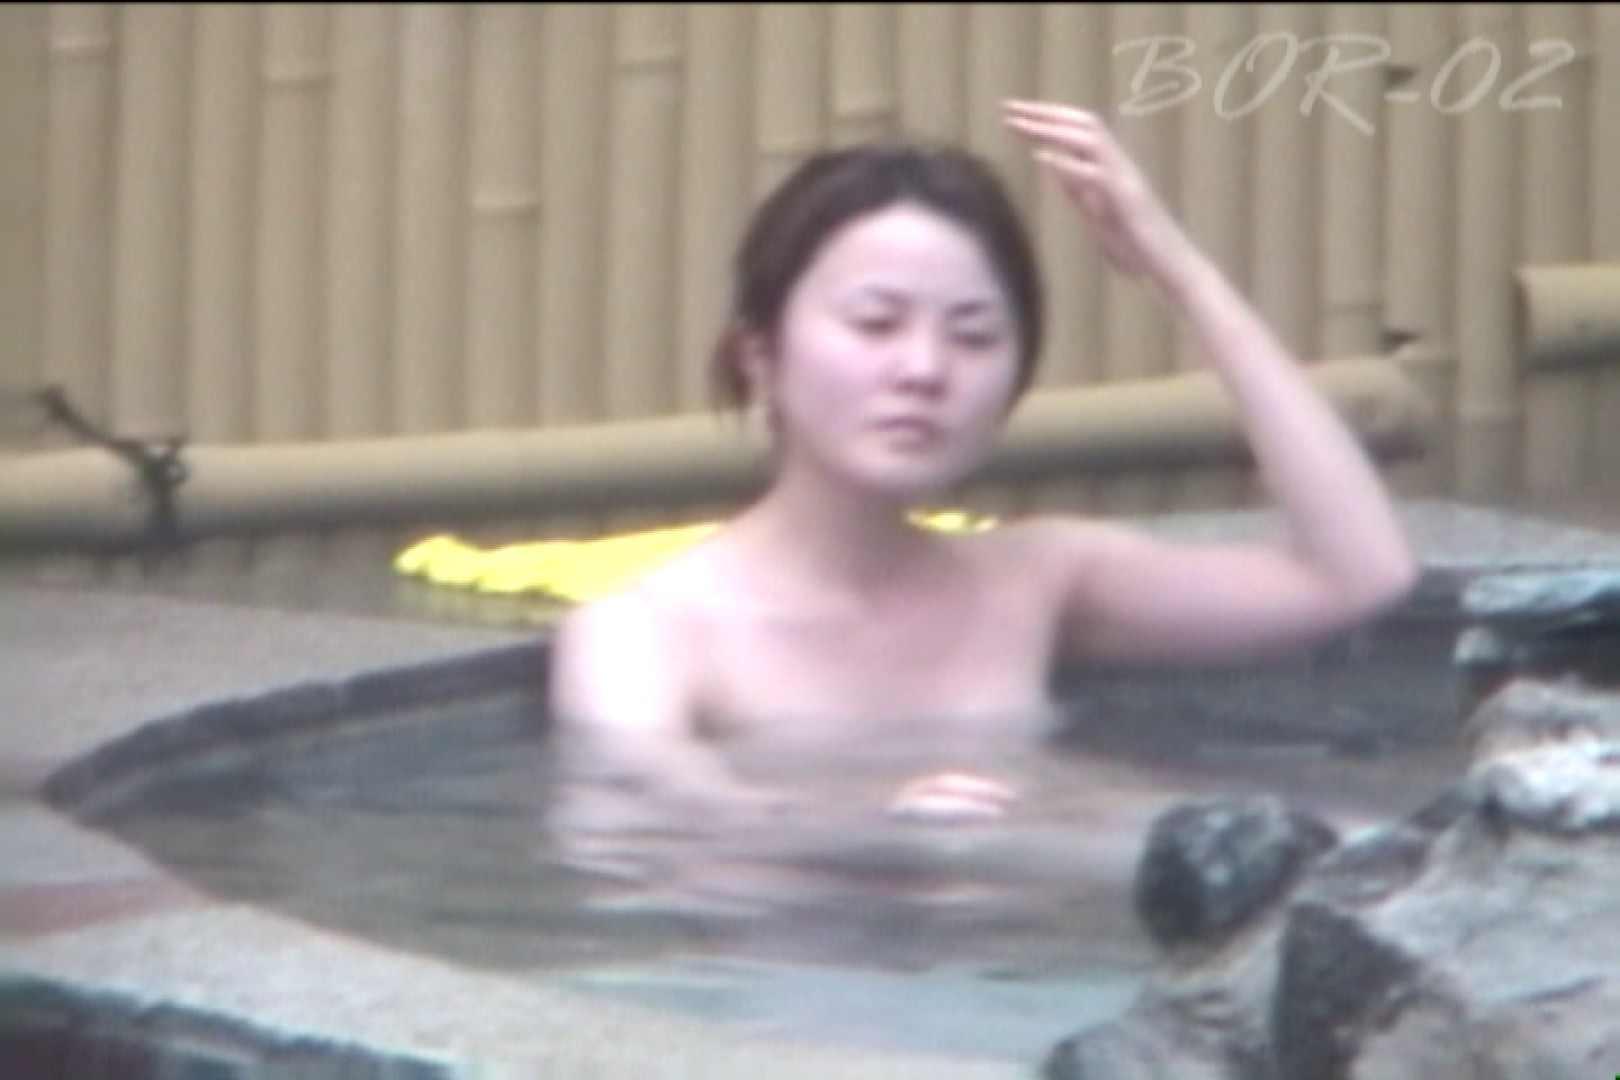 Aquaな露天風呂Vol.474 盗撮シリーズ | 露天風呂編  111PIX 95